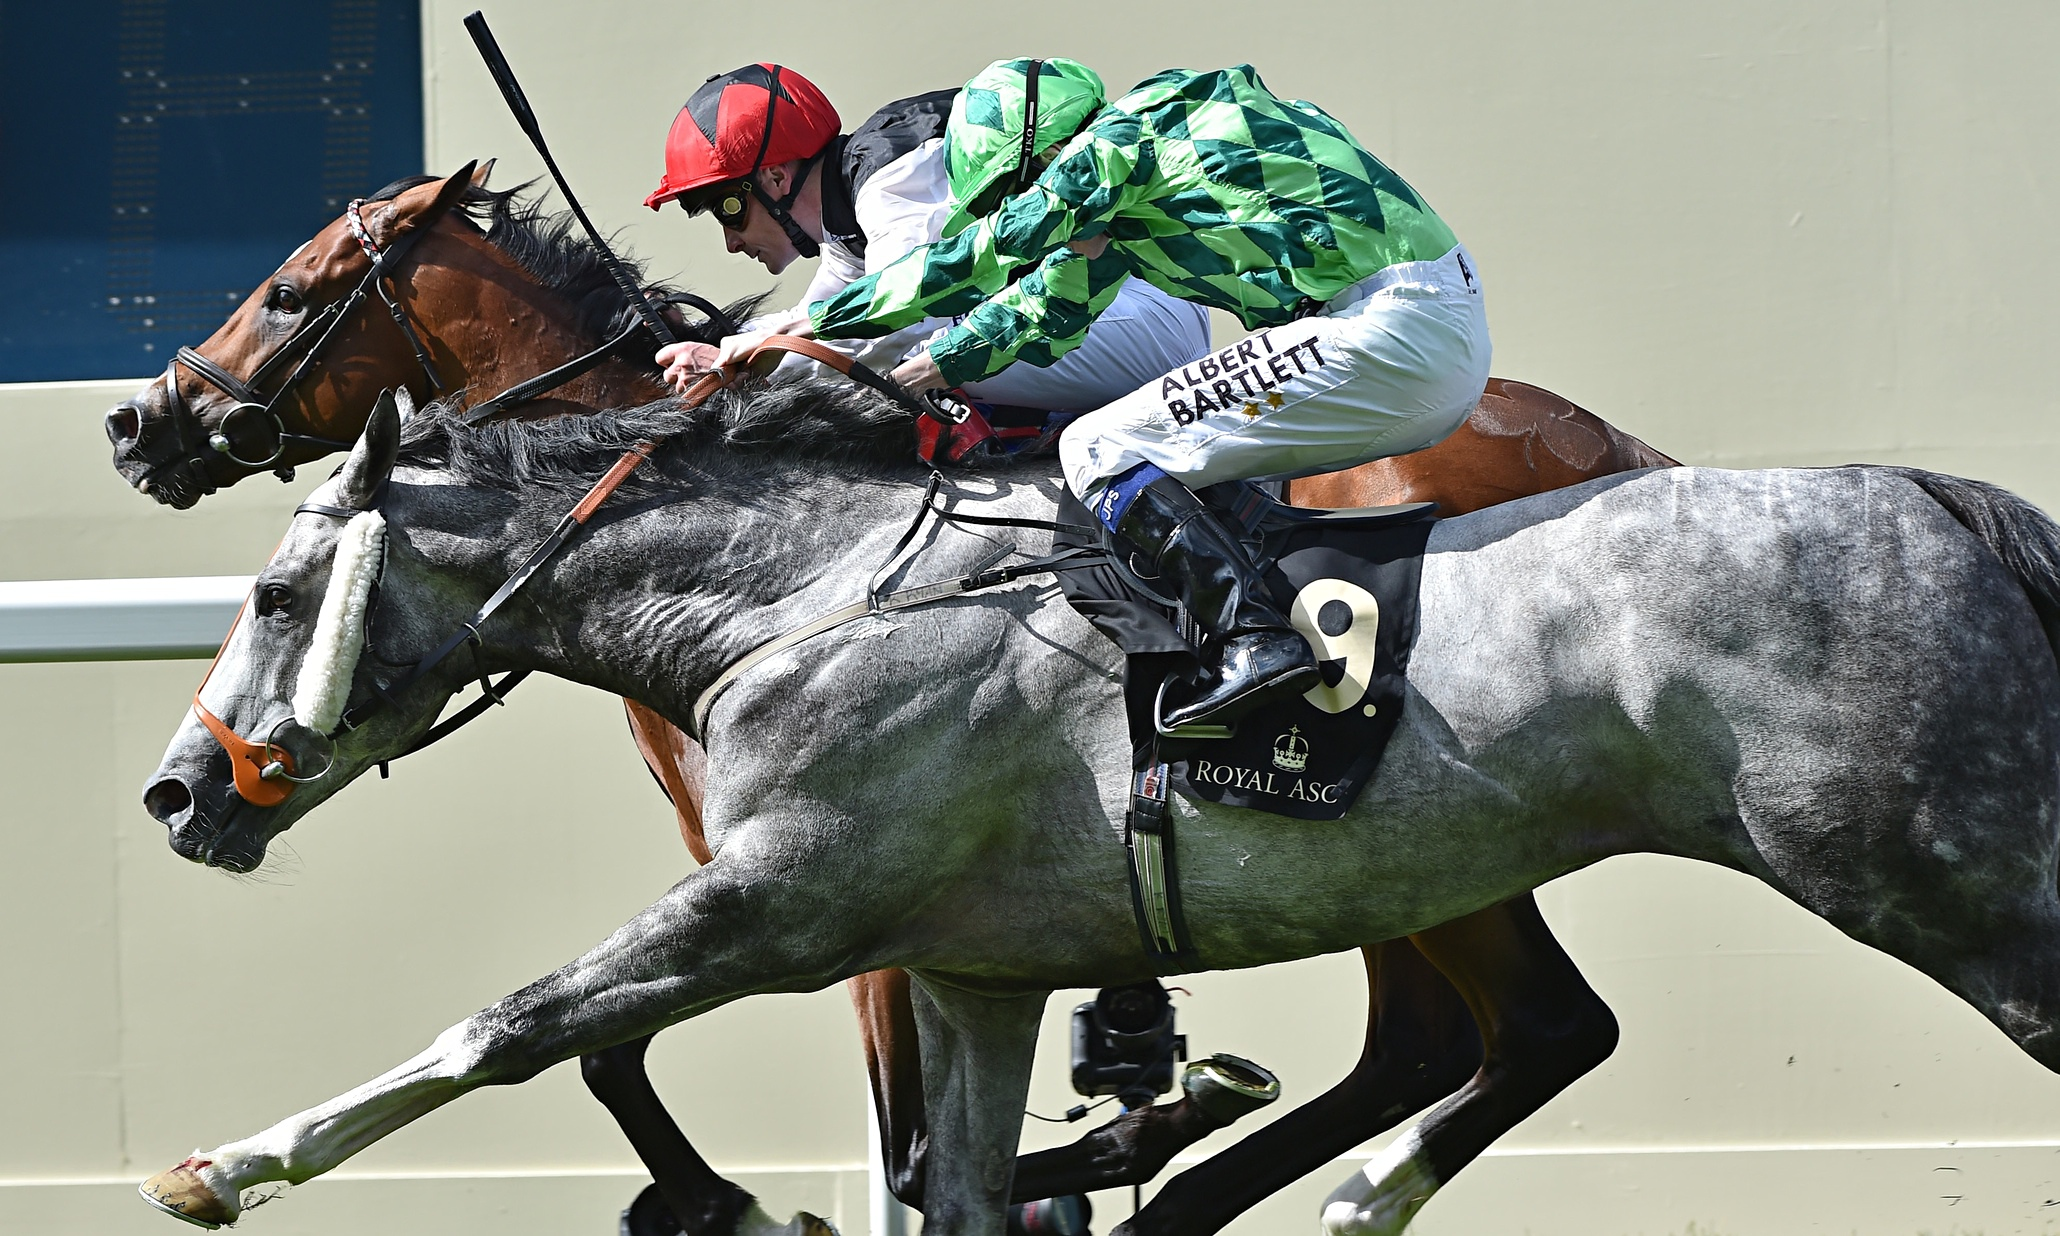 horse racing tips free uk dating